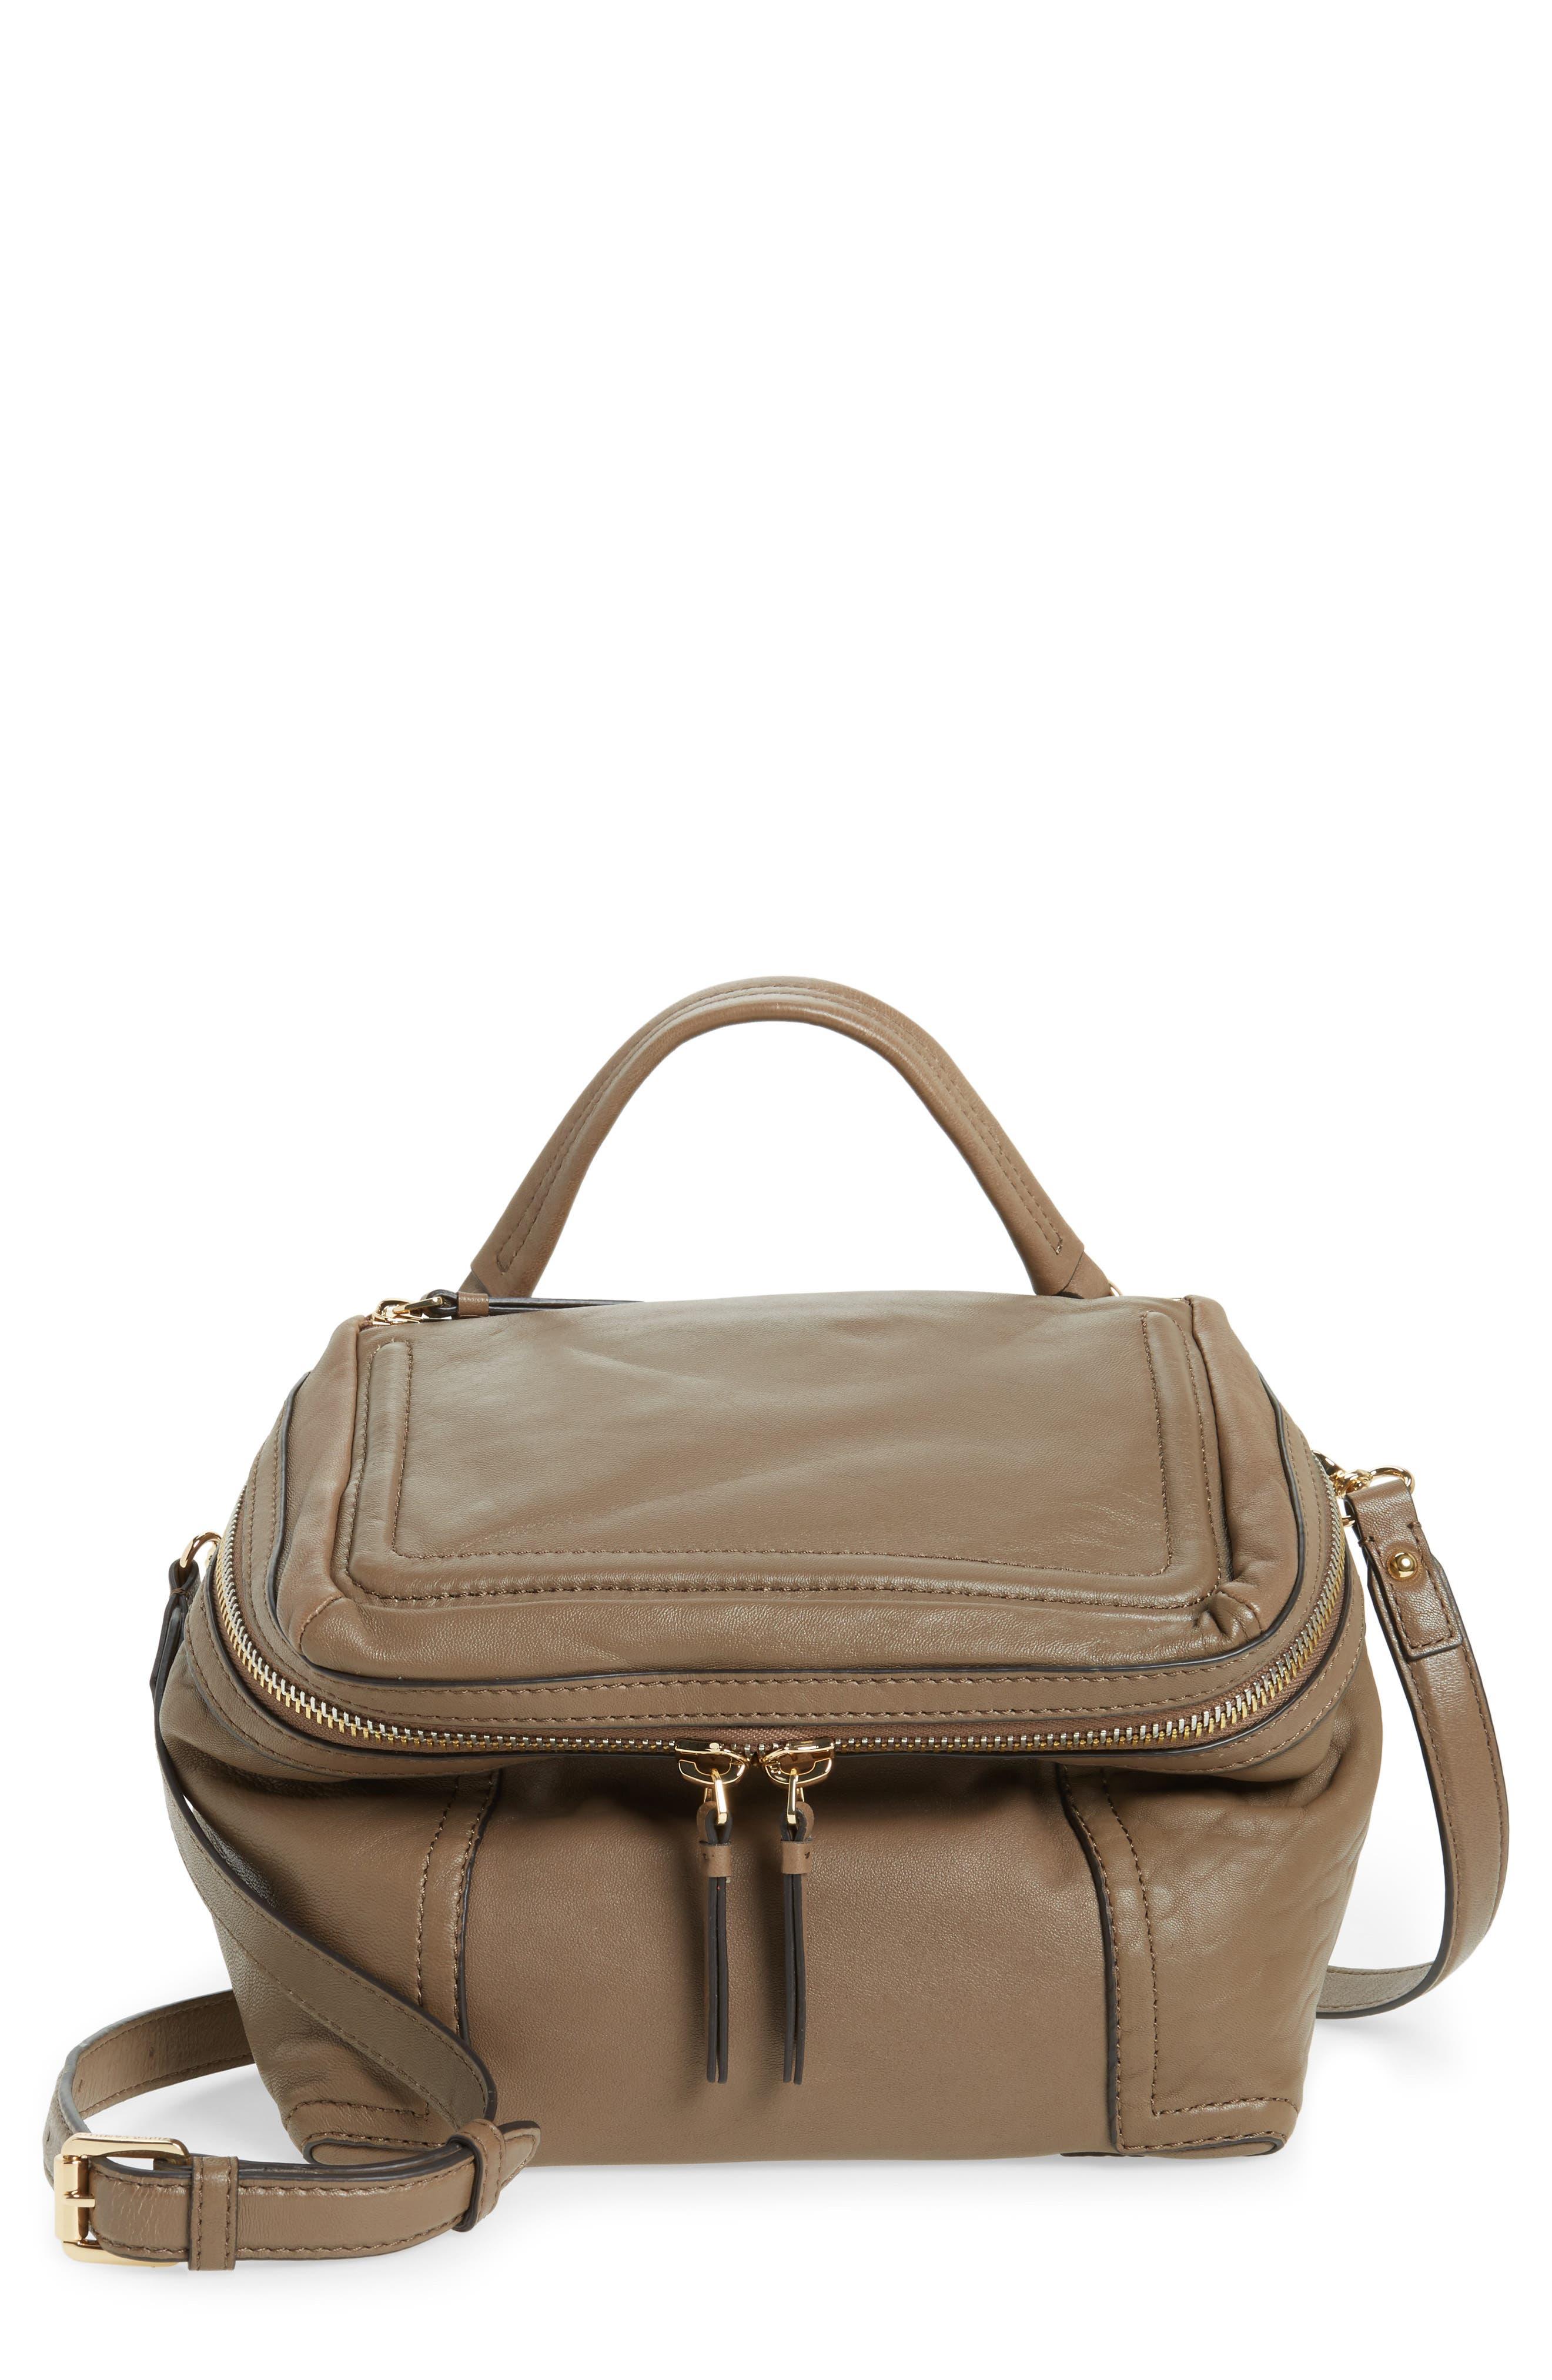 Medium Patch Leather Crossbody Bag,                             Main thumbnail 2, color,